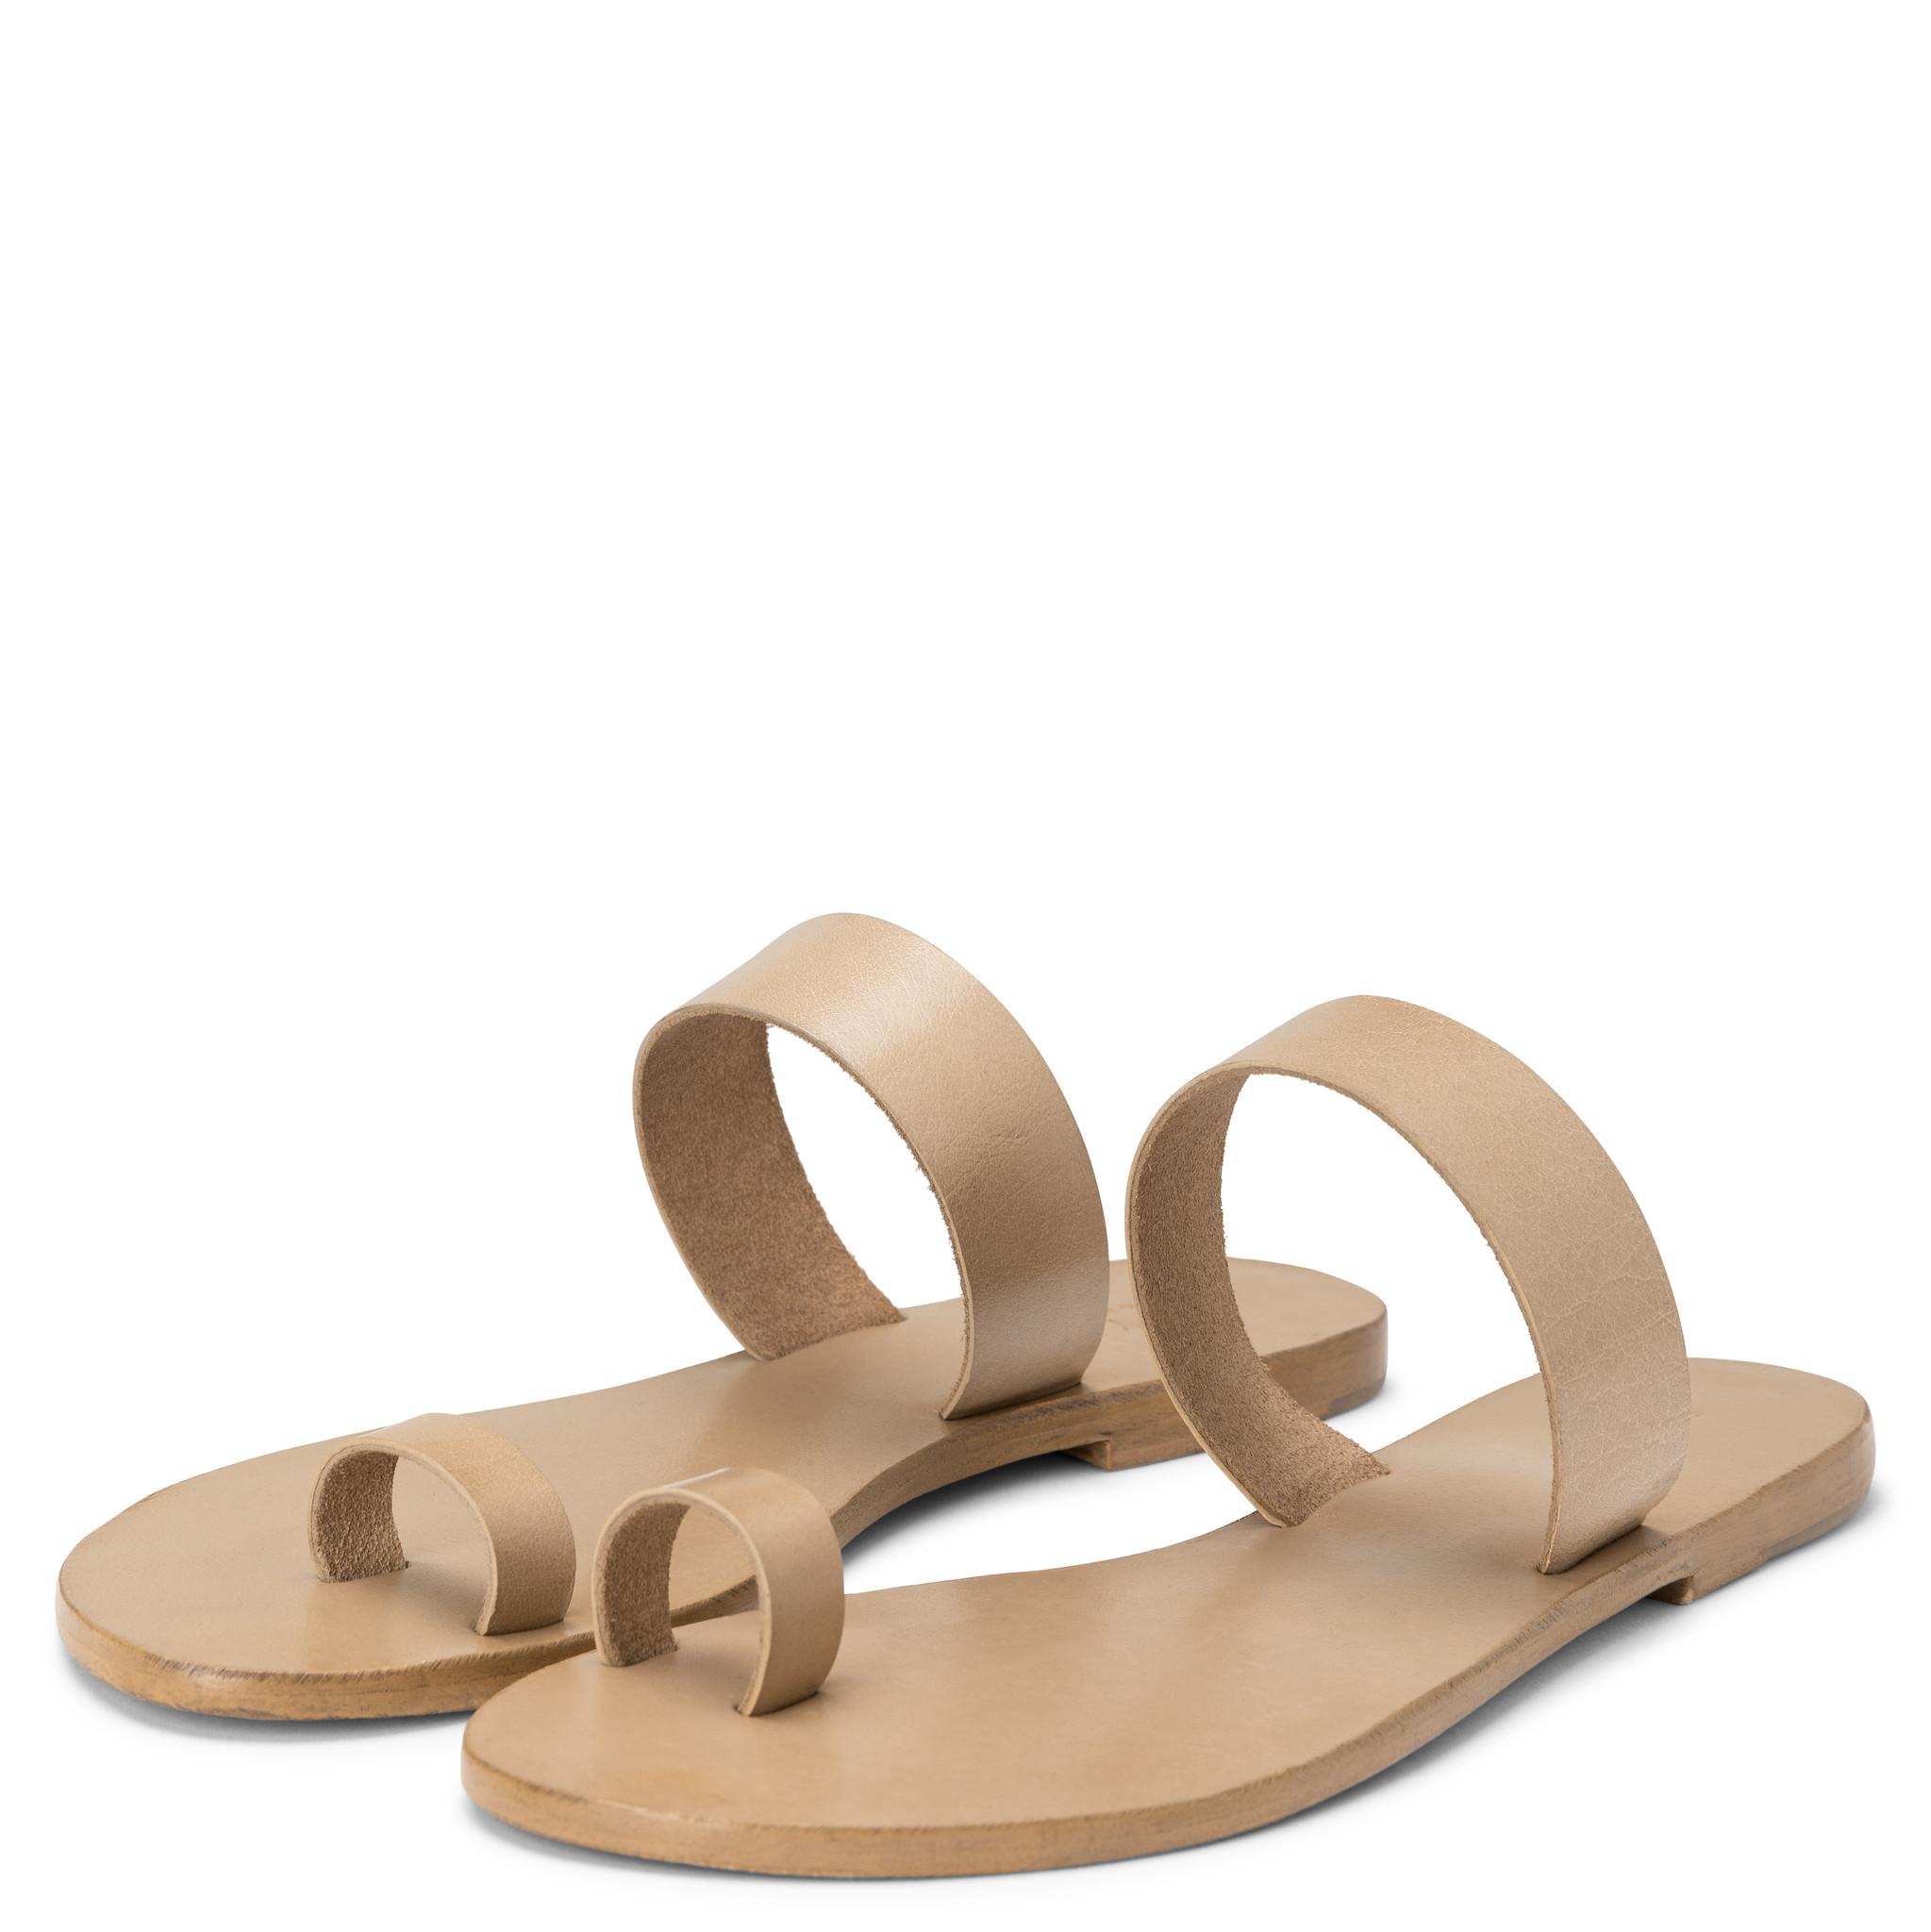 yaya Leather slipper 1343084-115-1